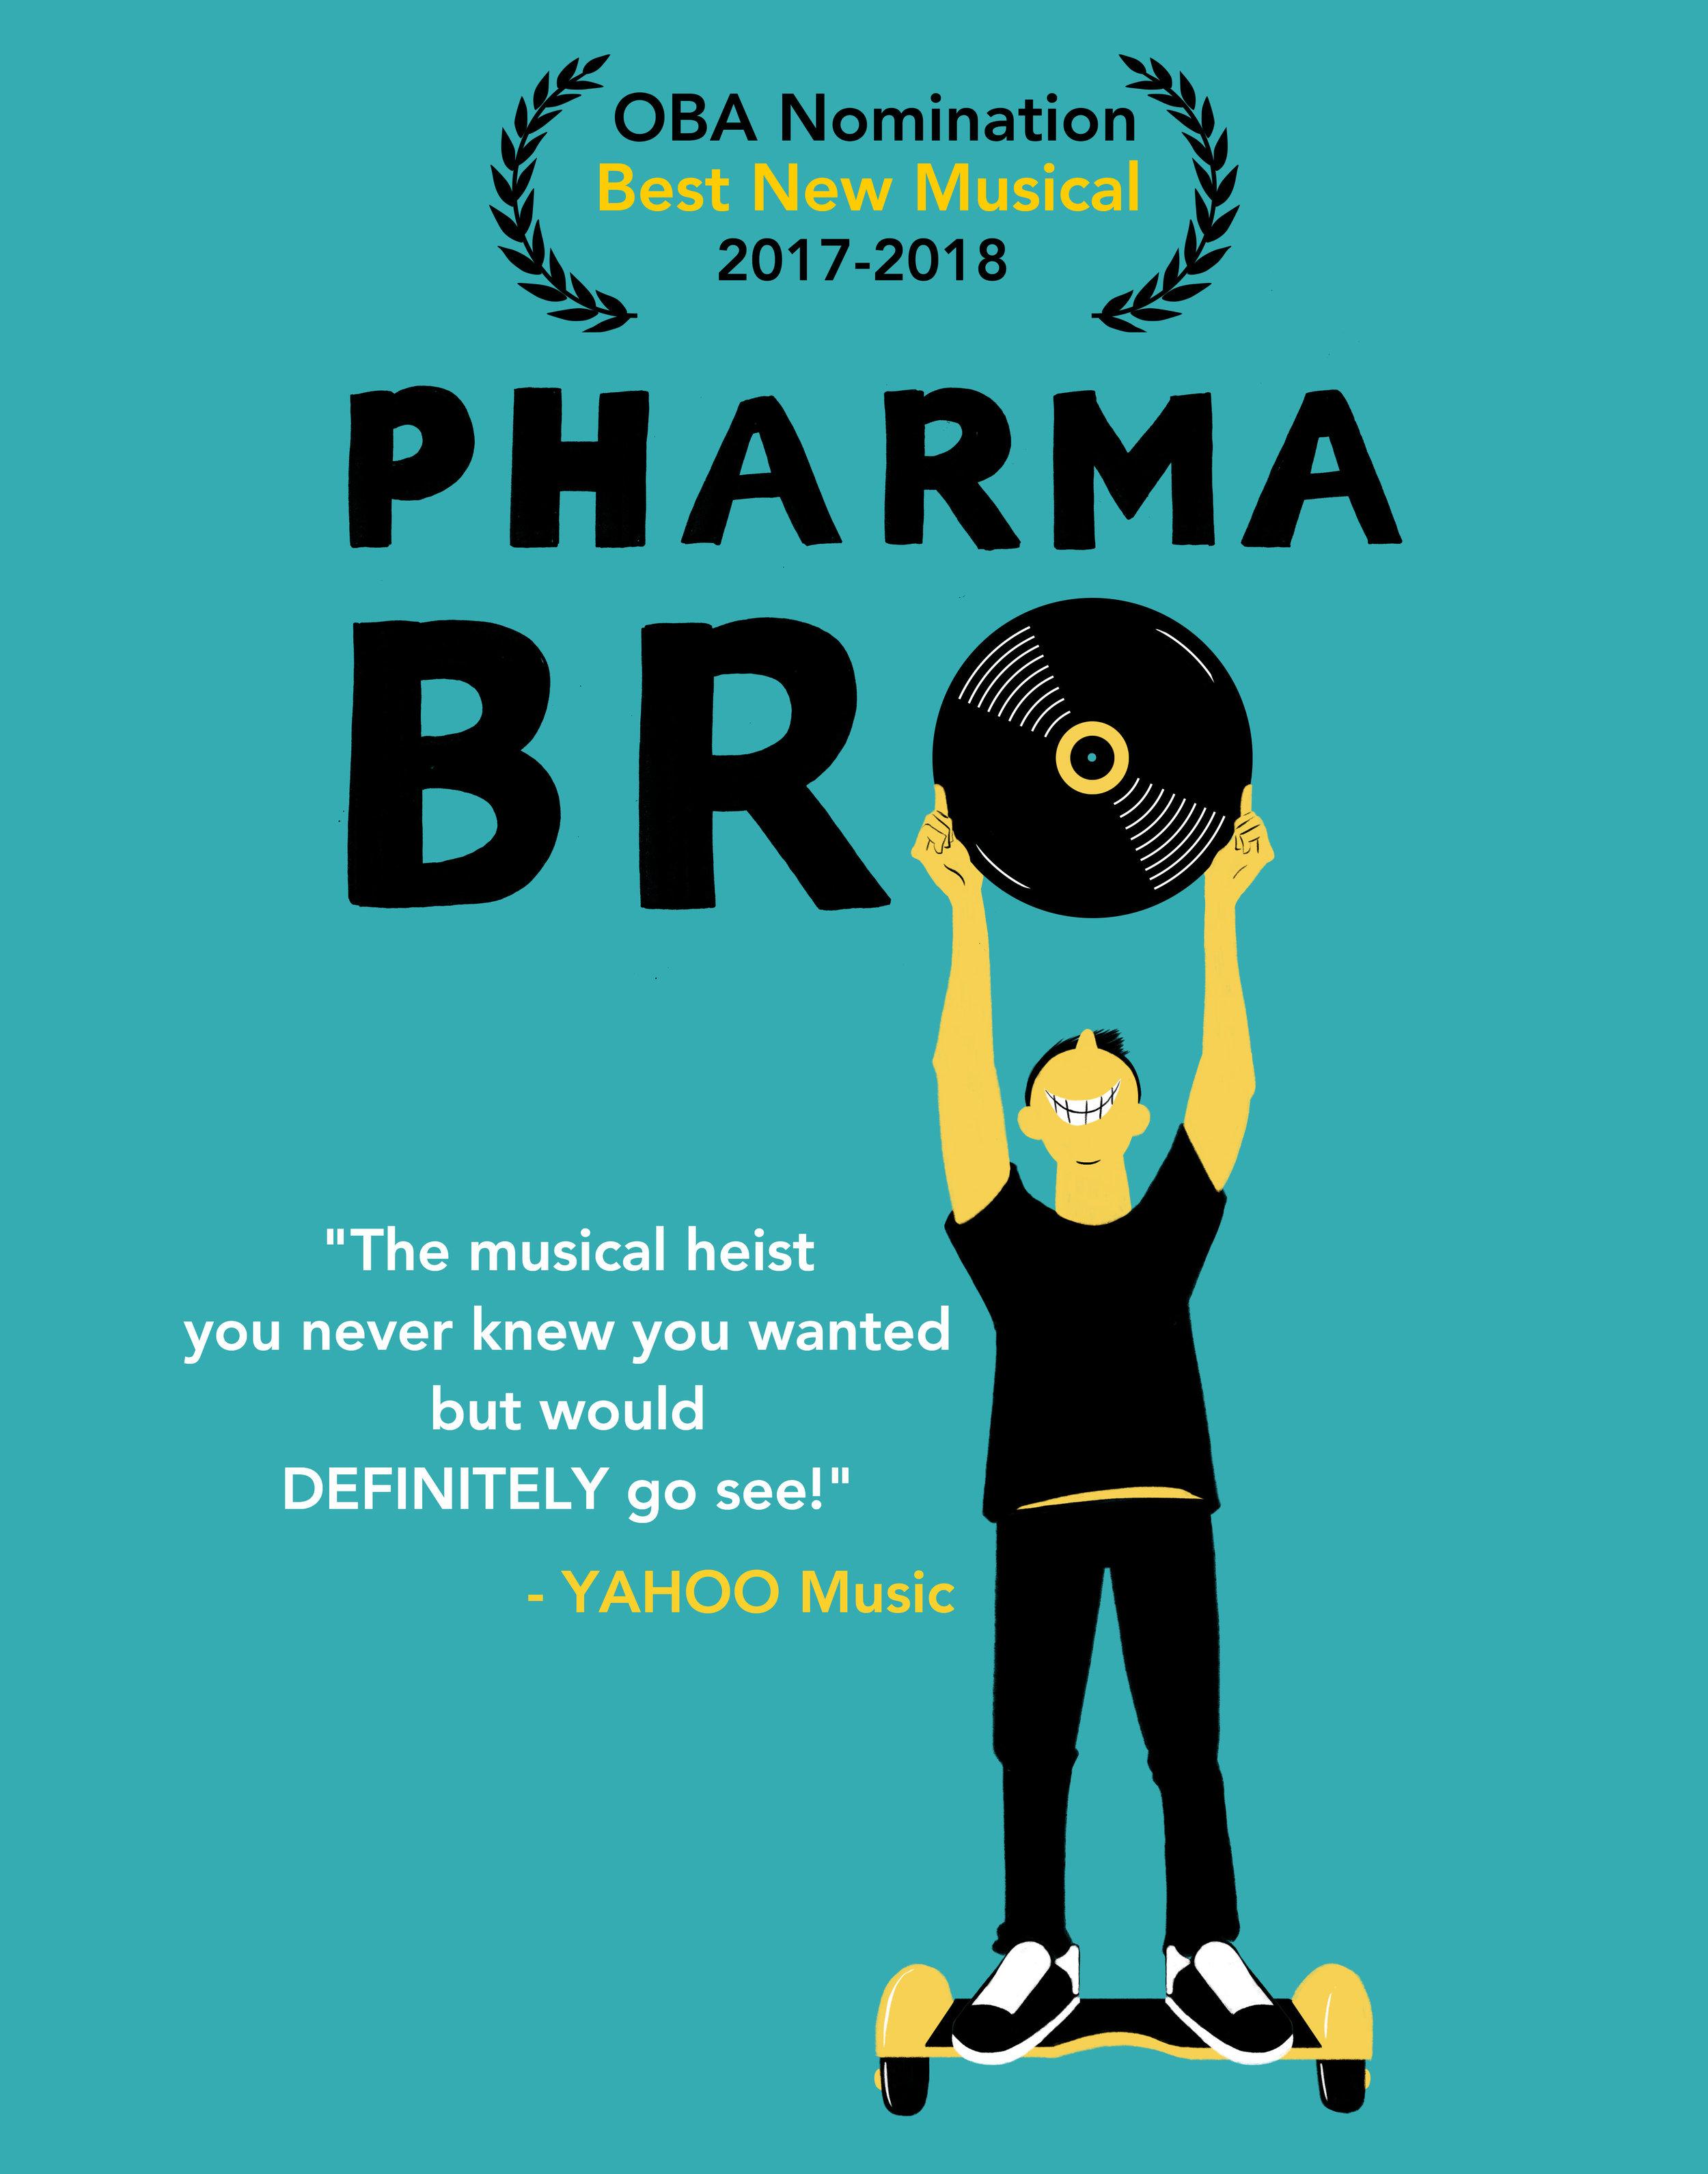 pharmabro_final_highres_award.jpg